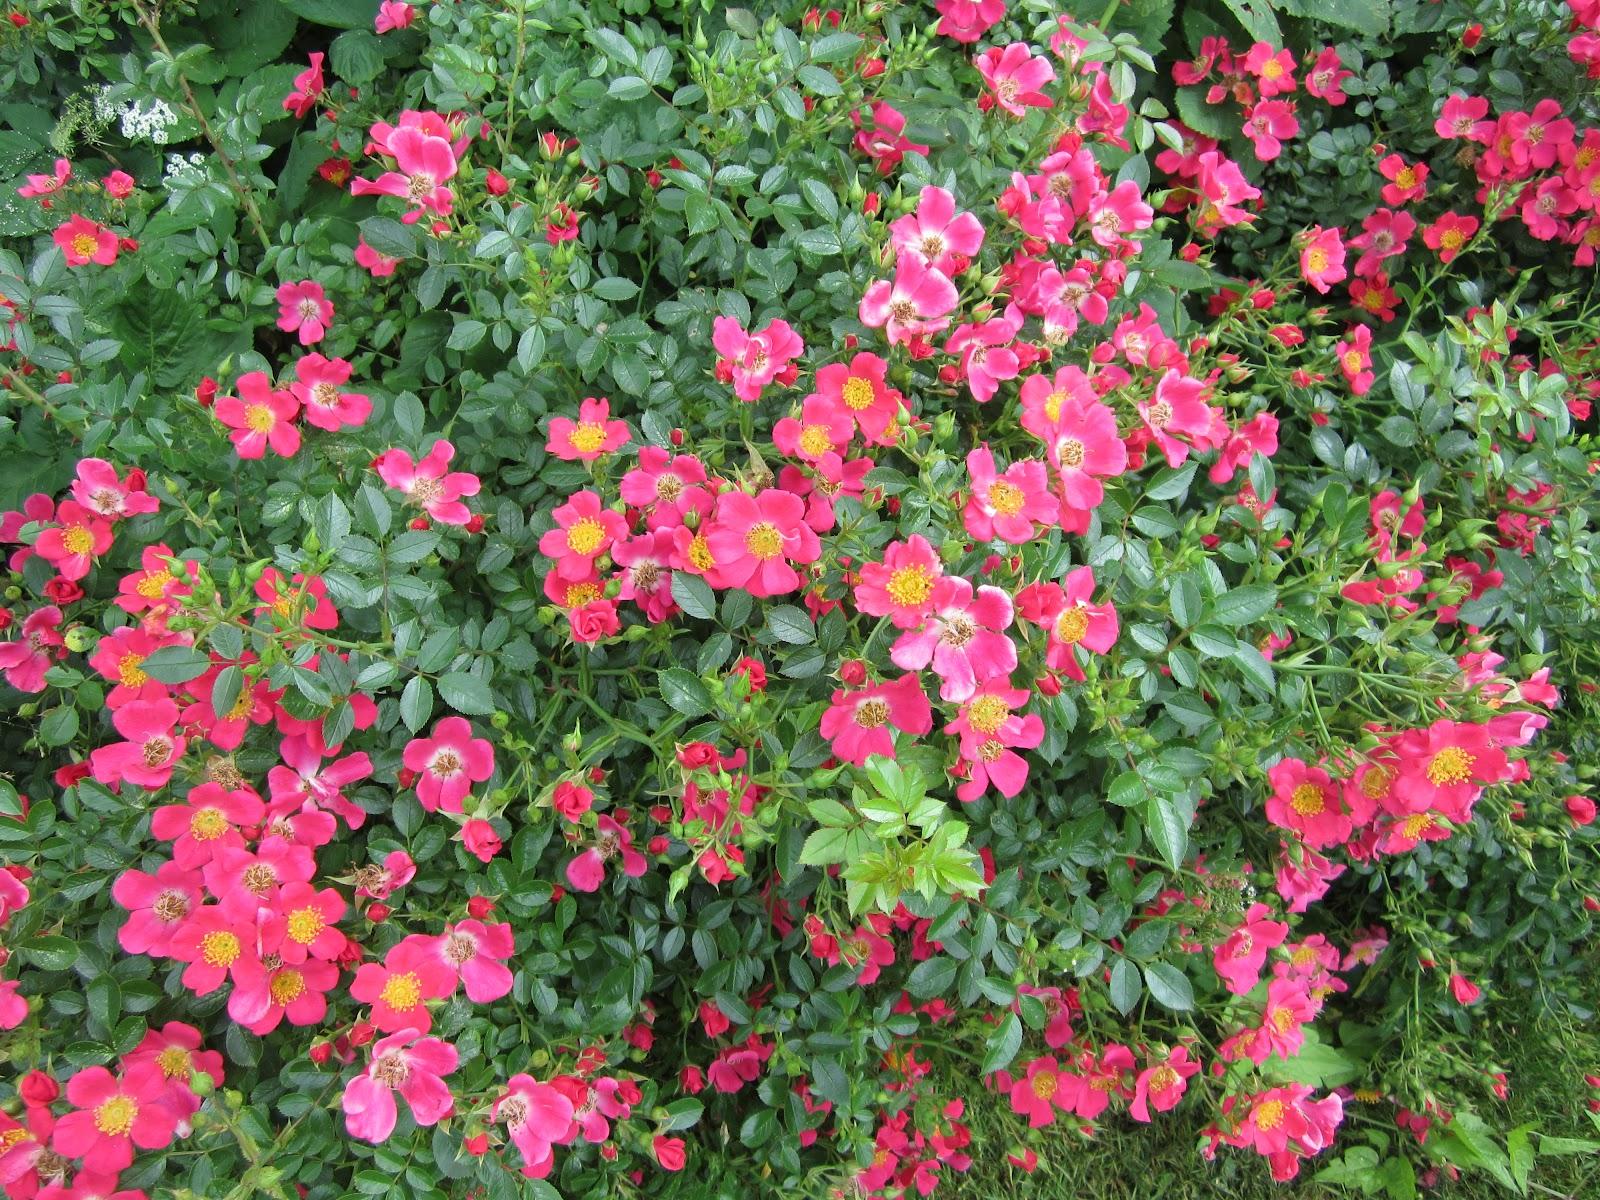 tommelise roser